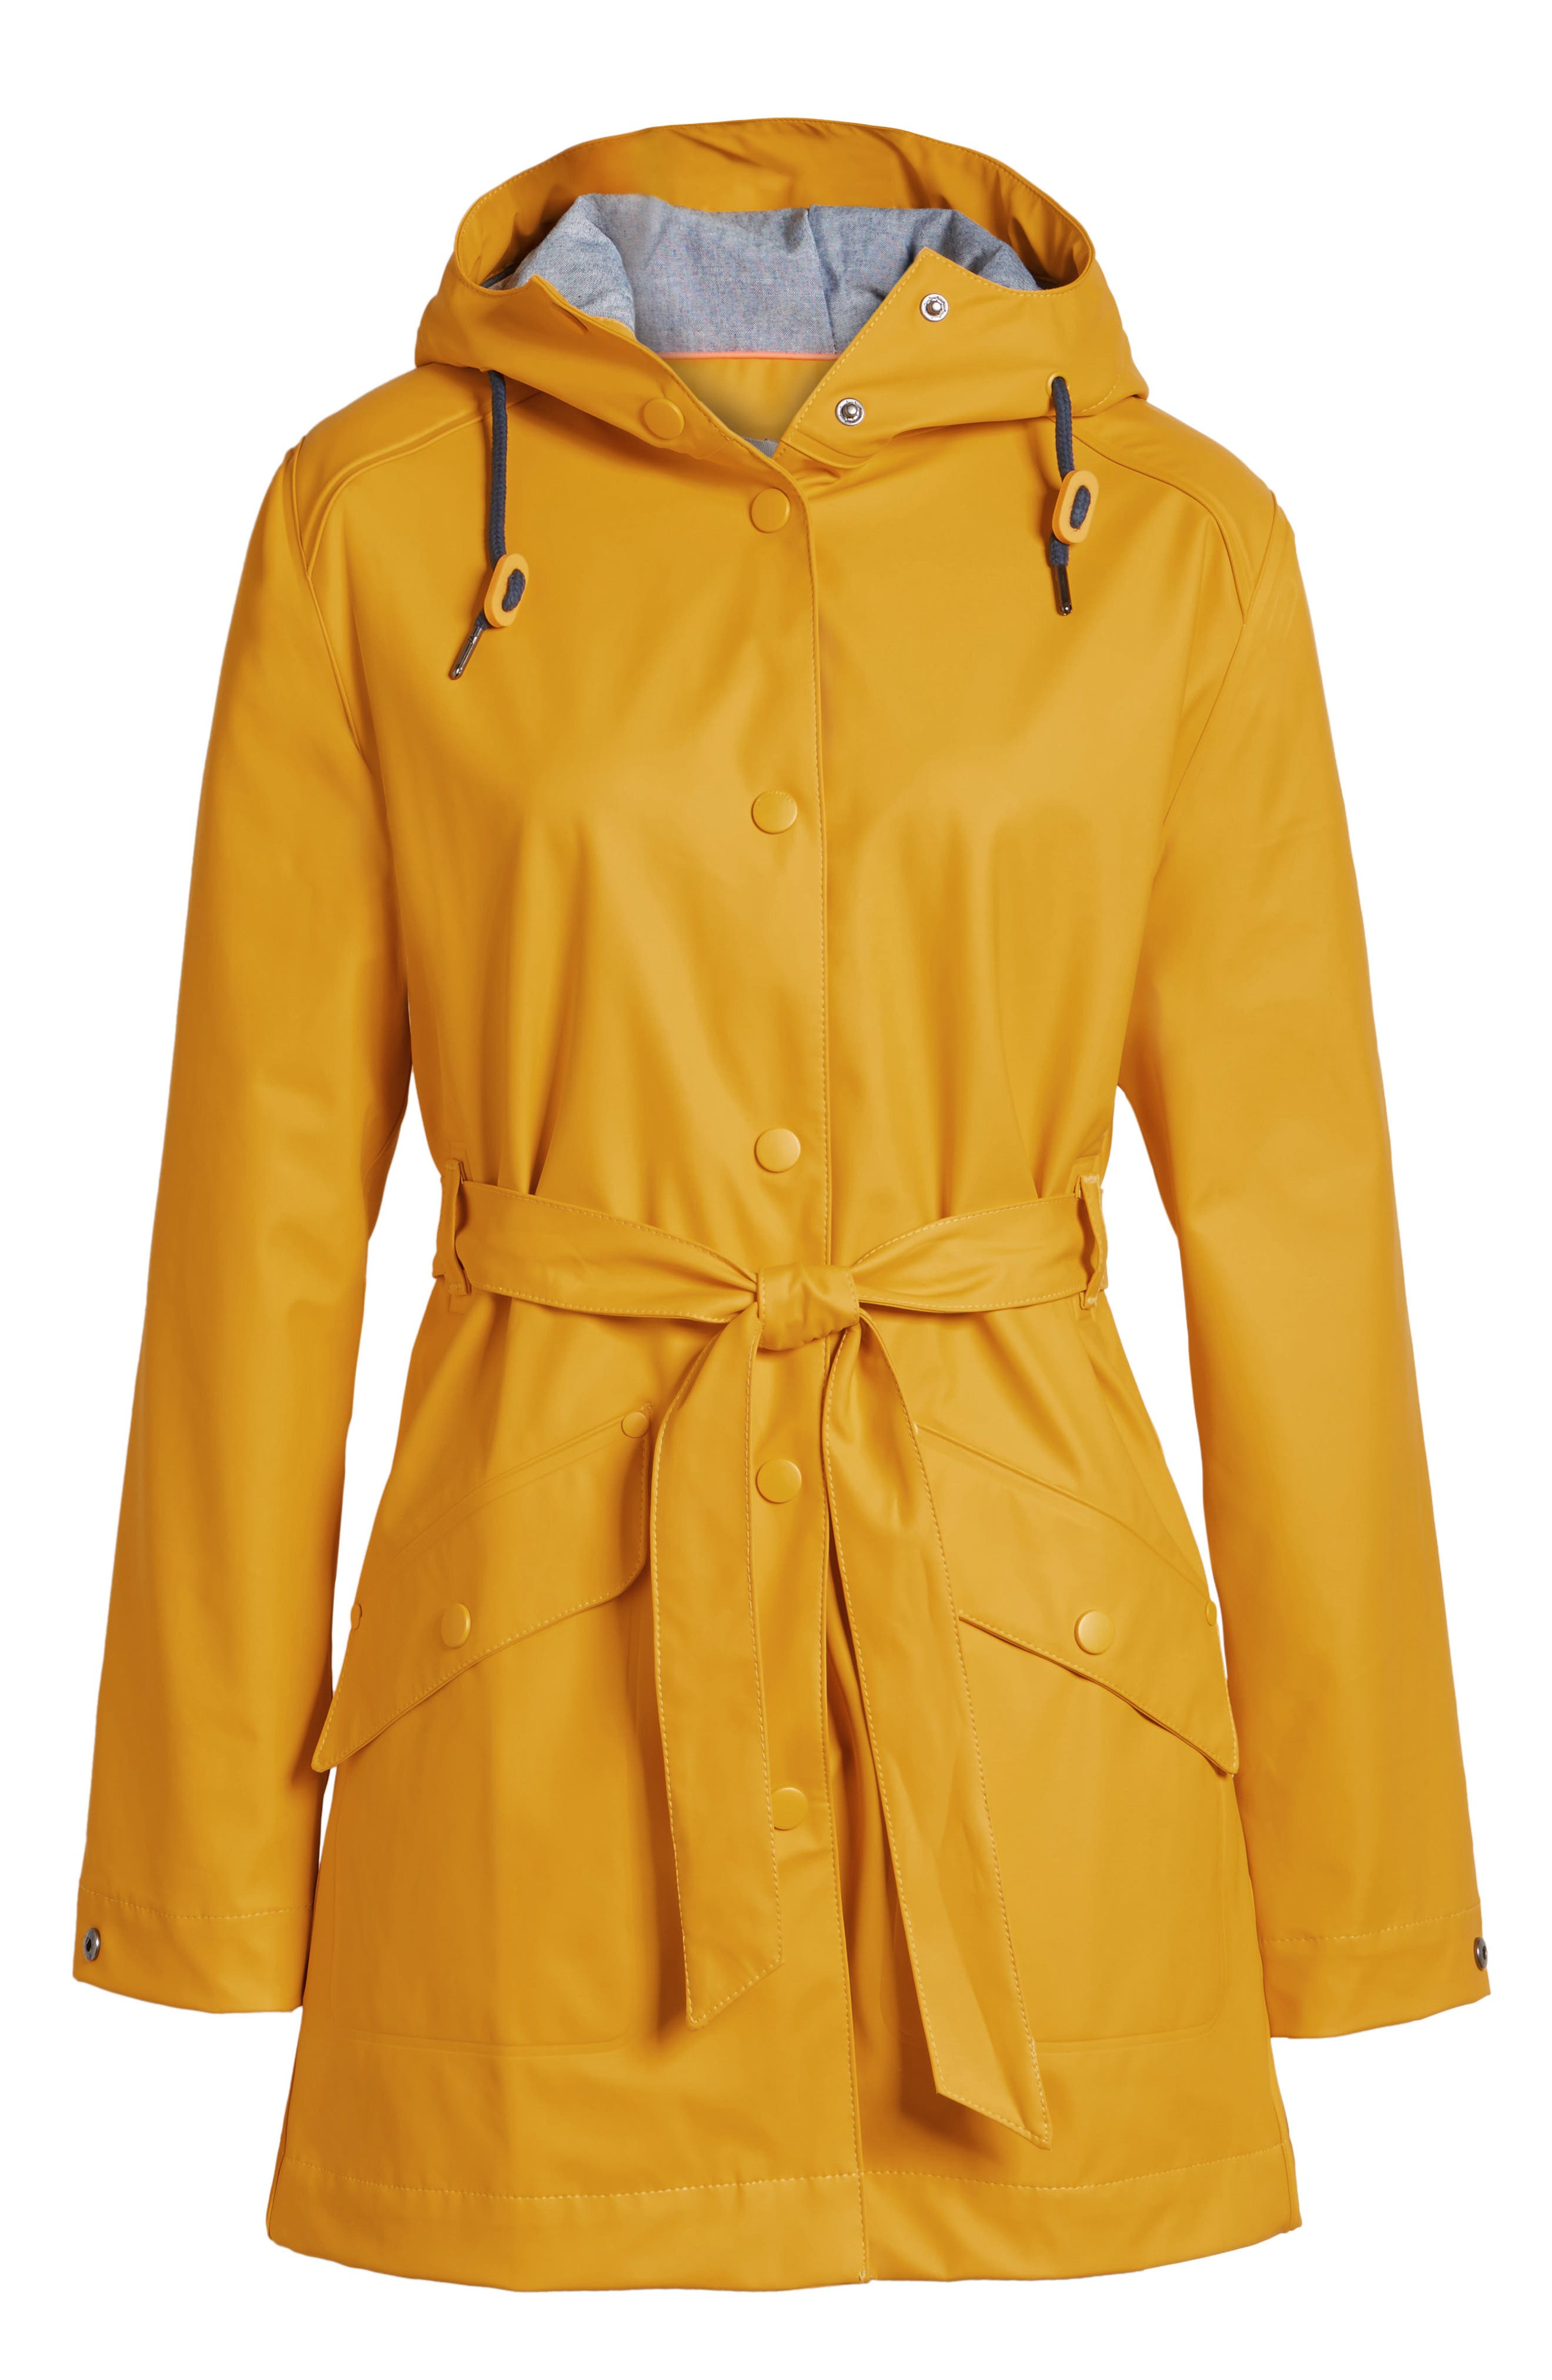 Kirkwall Raincoat,                             Alternate thumbnail 6, color,                             ESSENTIAL YELLOW